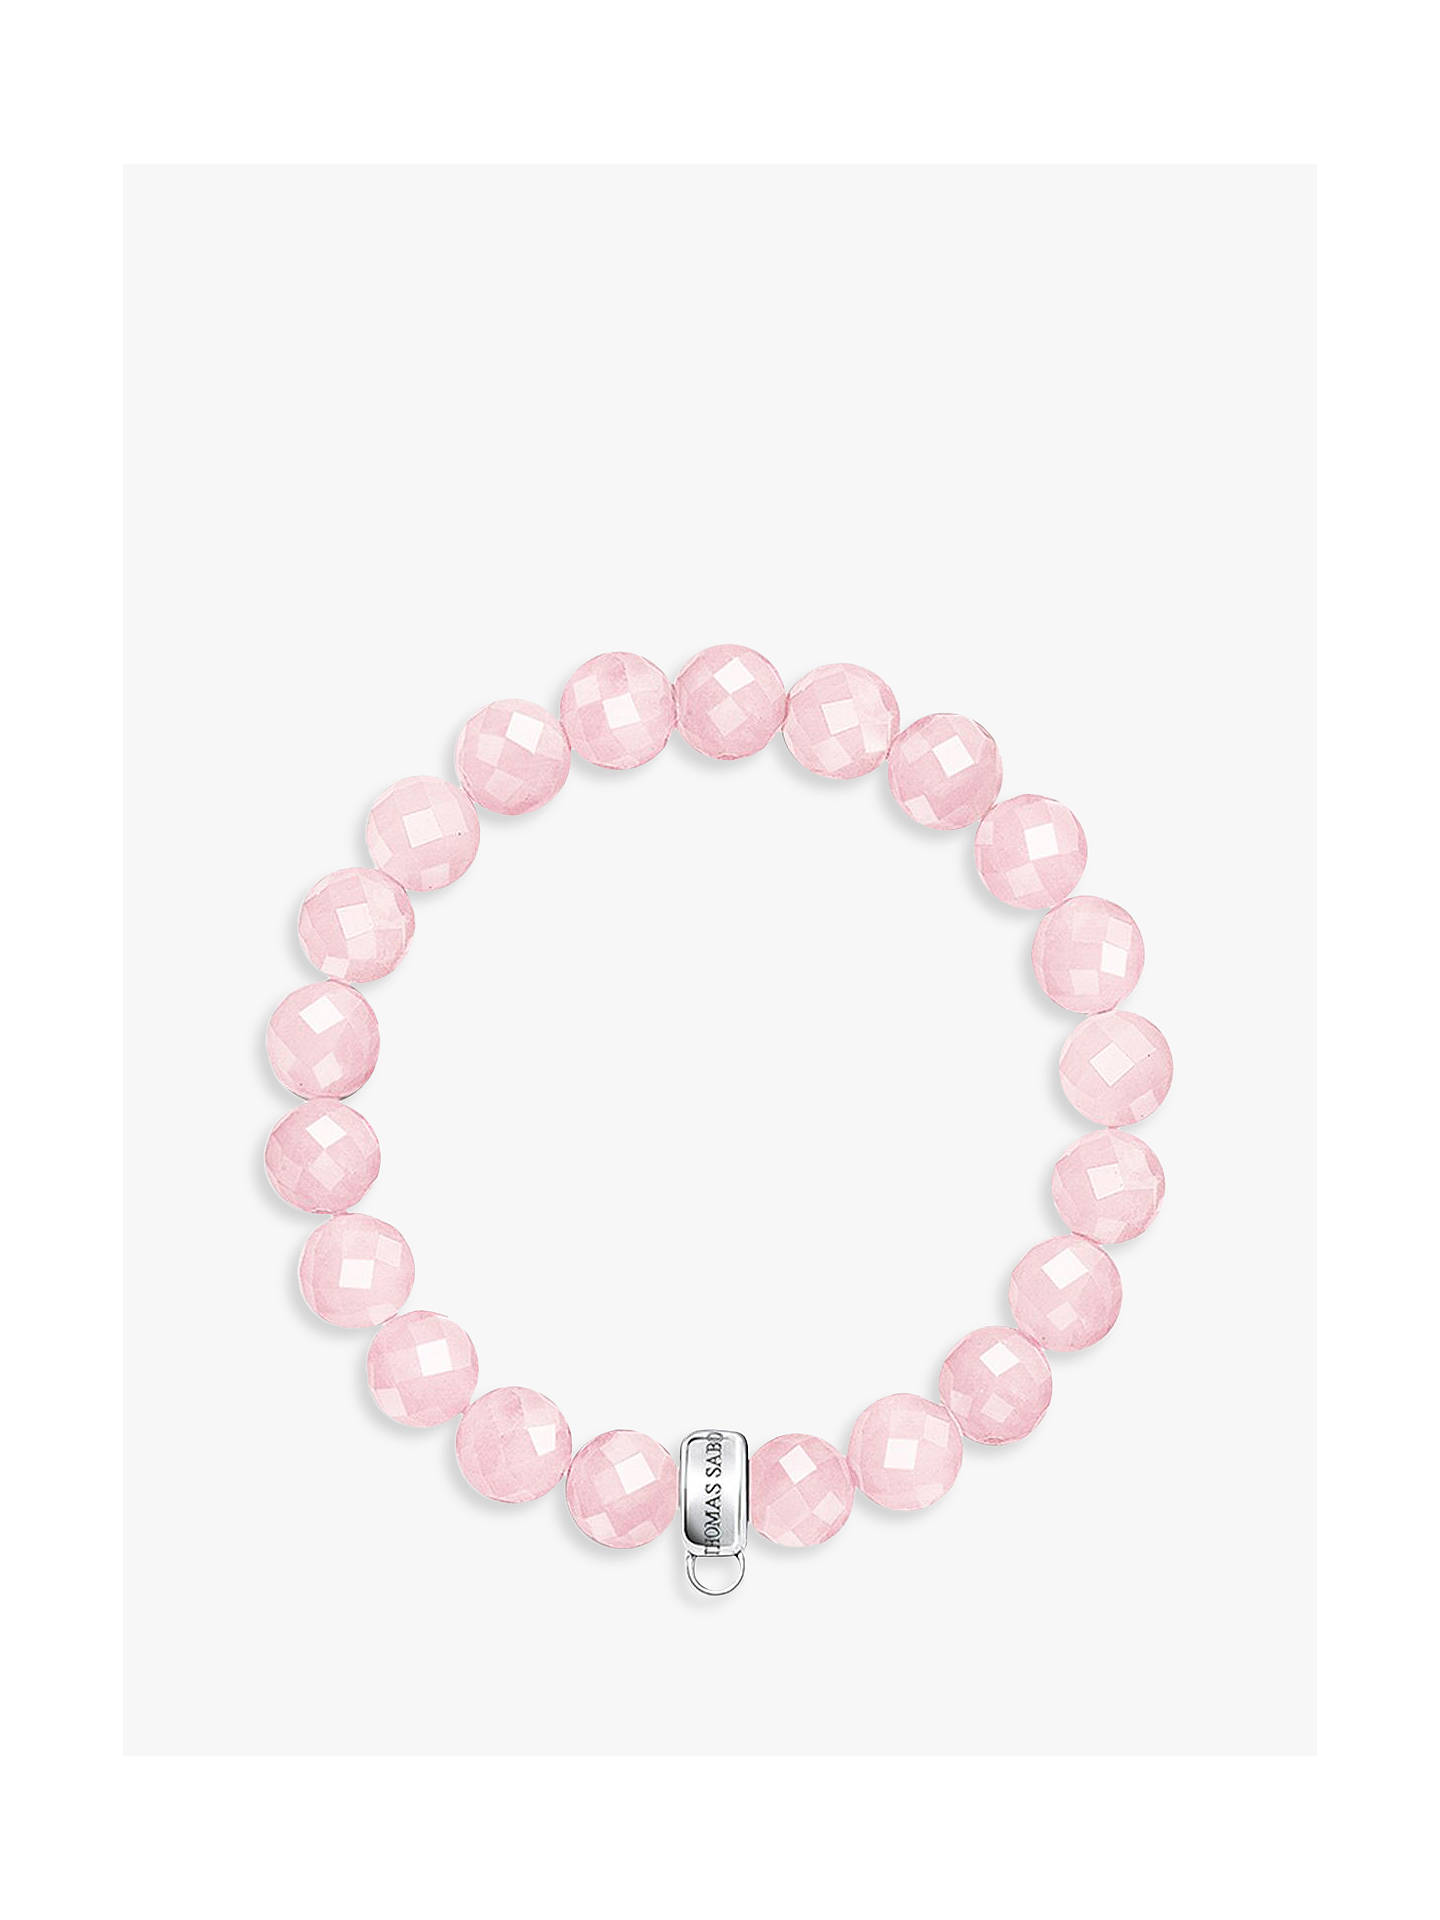 thomas sabo charm club rose quartz bracelet pink at john lewis partners. Black Bedroom Furniture Sets. Home Design Ideas